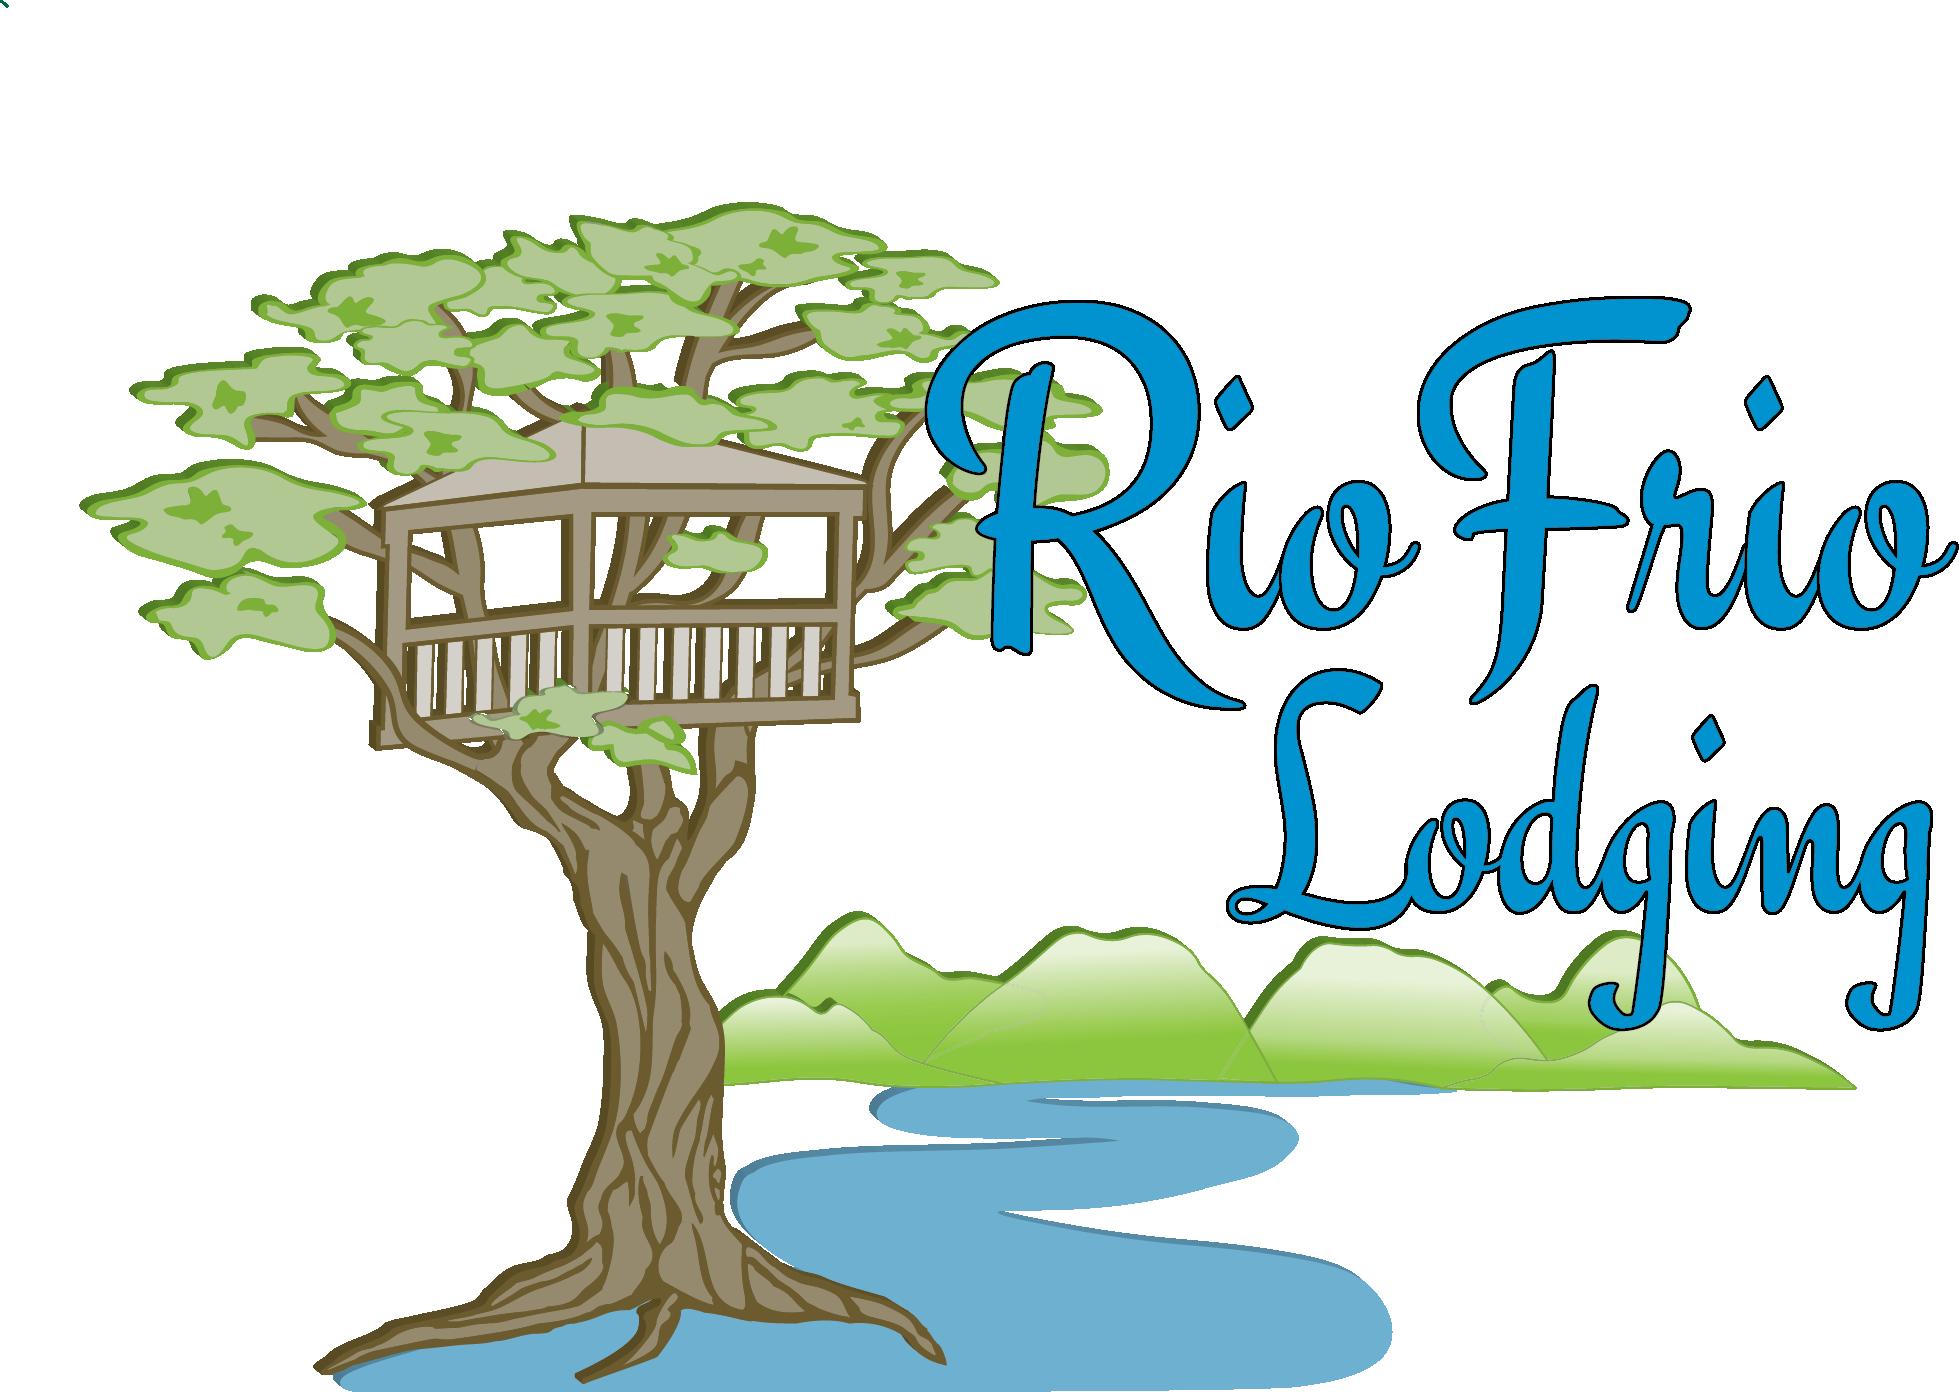 Frio river treetop rio. Telephone clipart cabin